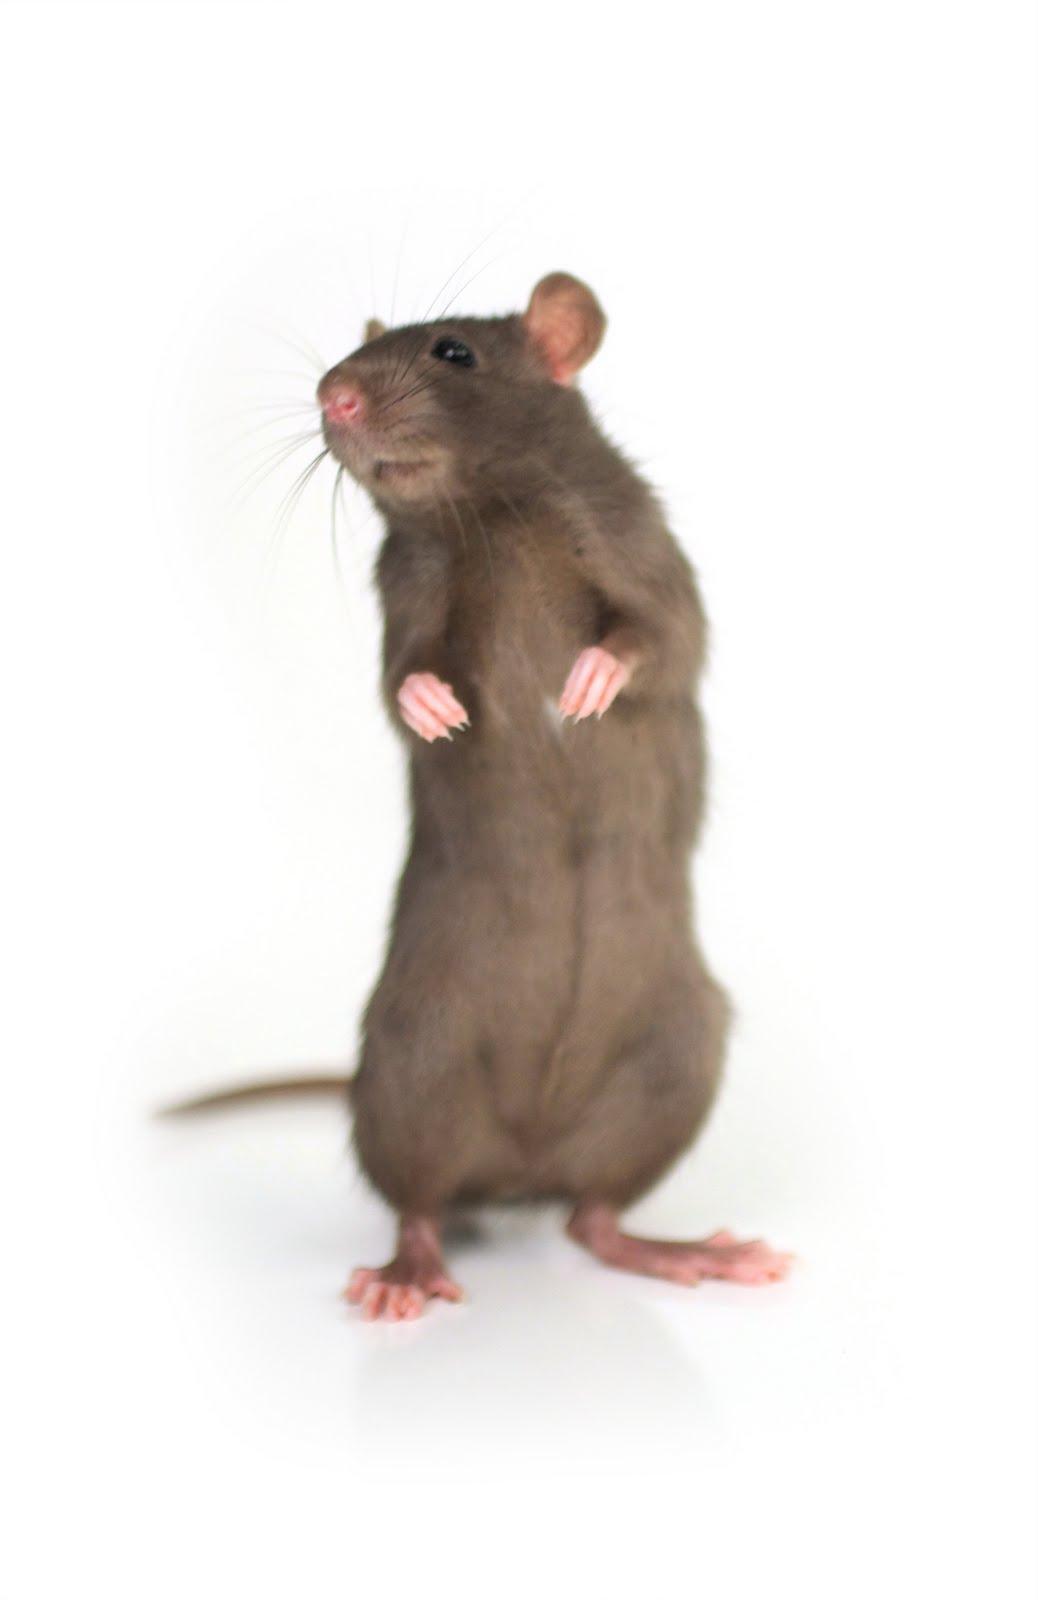 carmichael watson project blog no rats in taransay. Black Bedroom Furniture Sets. Home Design Ideas